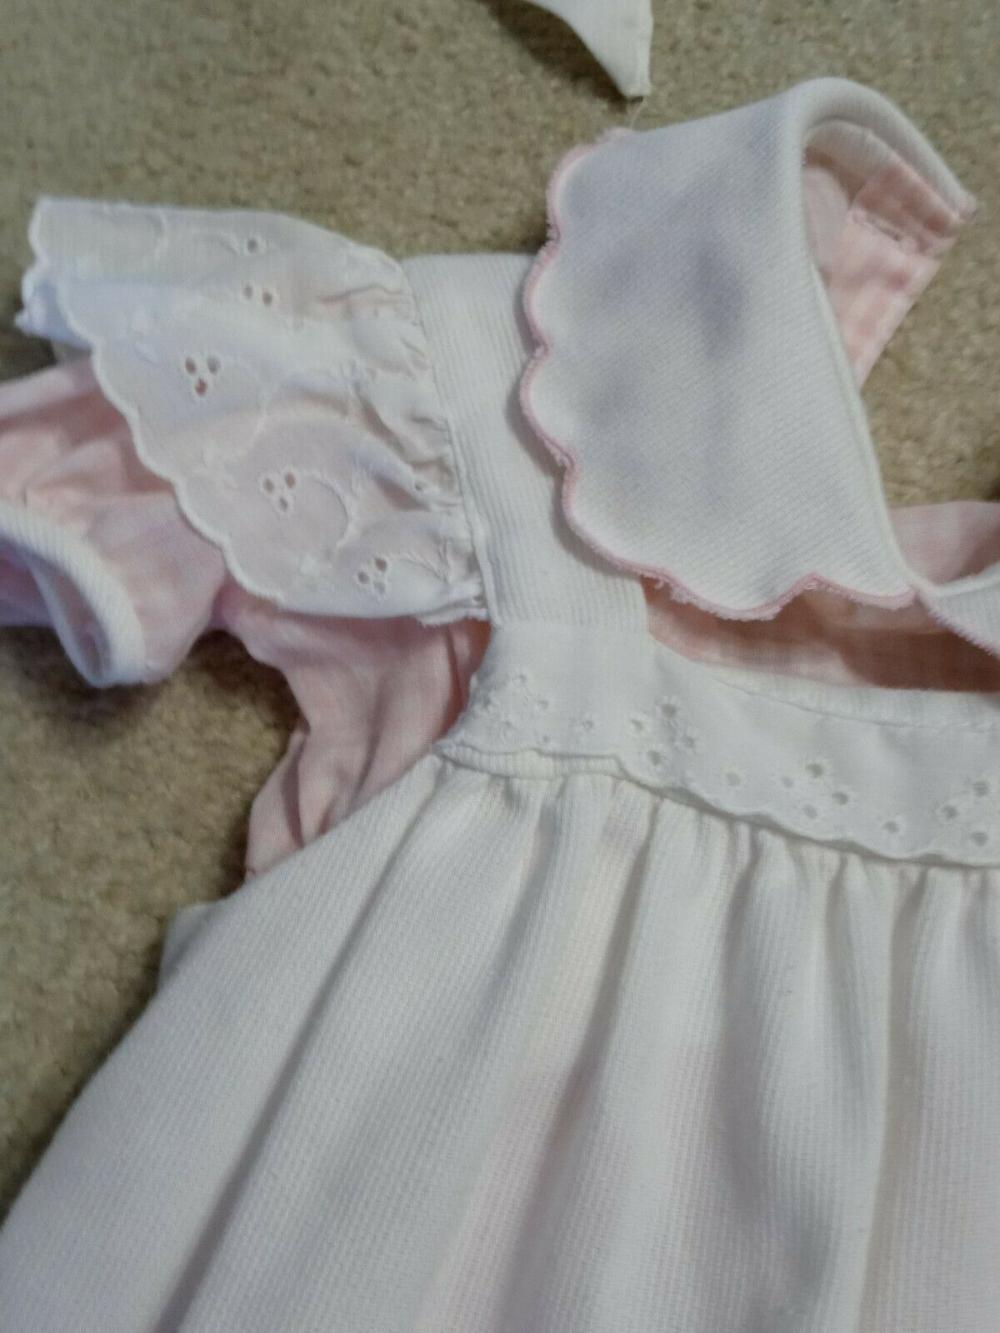 Vintage Toddler Nursery Rhymes Gingham Dress White Pinafores Size 4t Ebay In 2021 Gingham Dress White Pinafore Vintage Toddler [ 1333 x 1000 Pixel ]